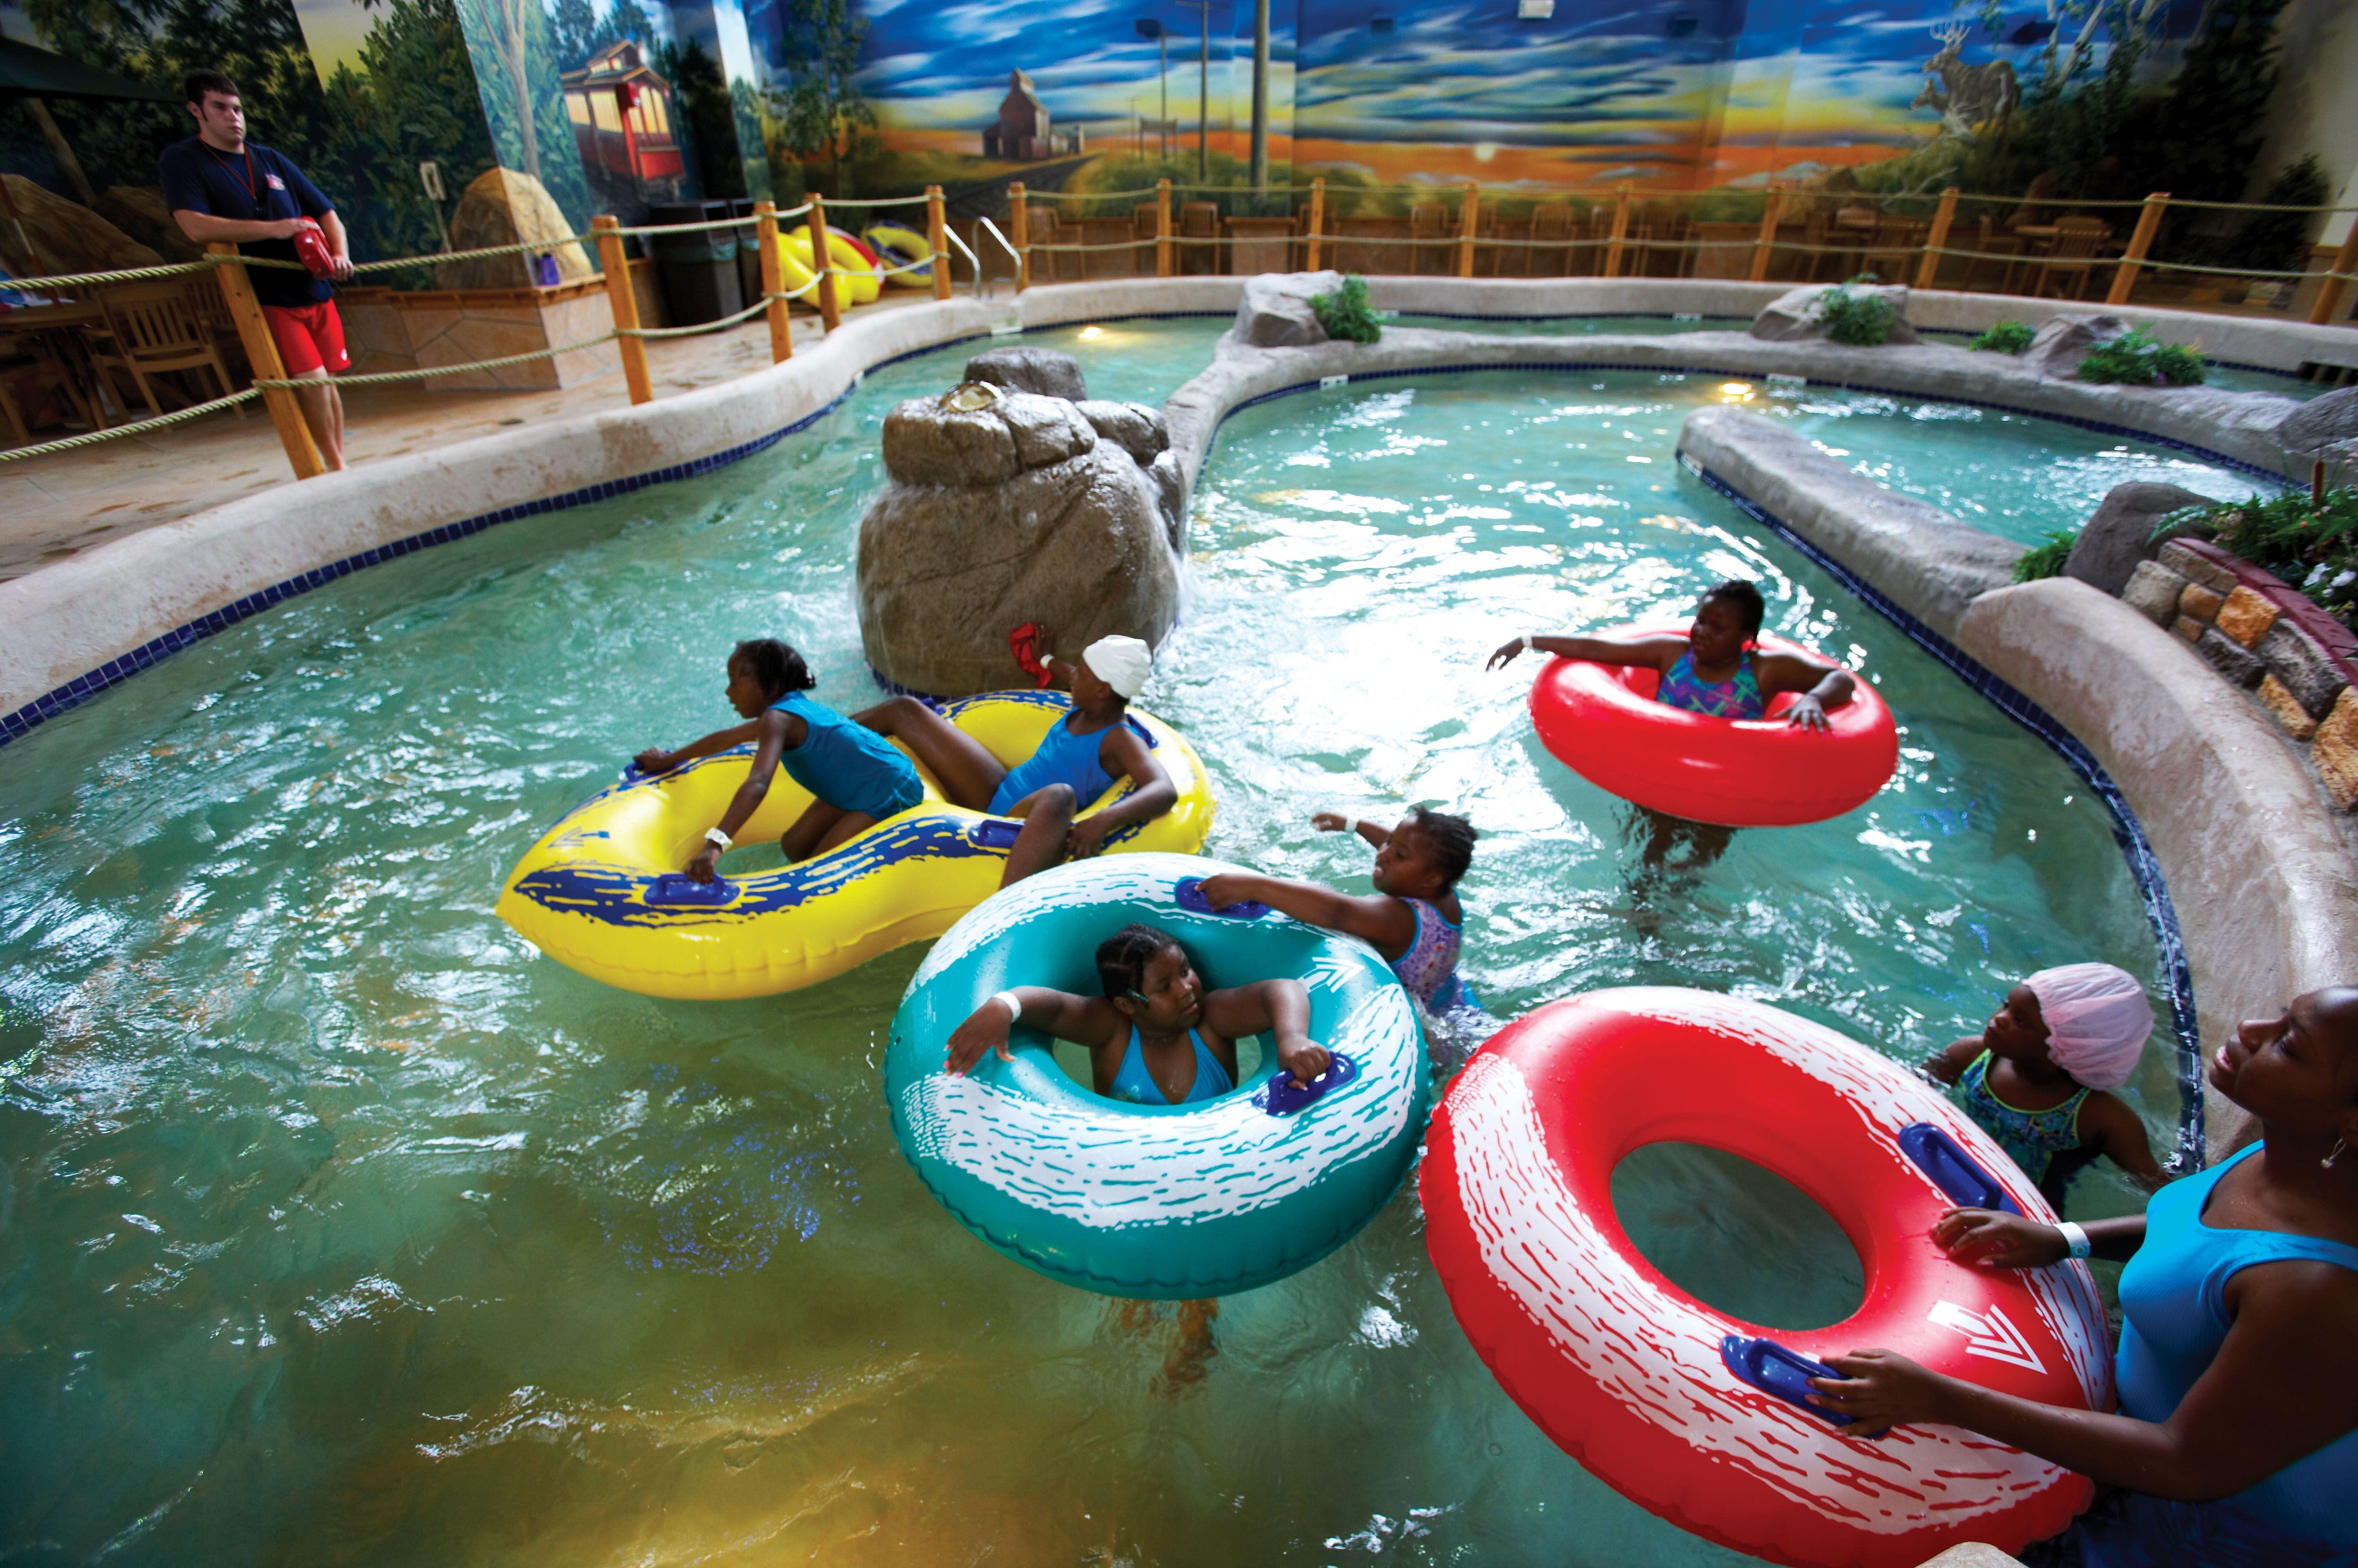 Thebarrelrollriver Innertubes Lazyriver Indoorwaterpark Fun Splash Indoor Waterpark Water Park Hot Tub Outdoor